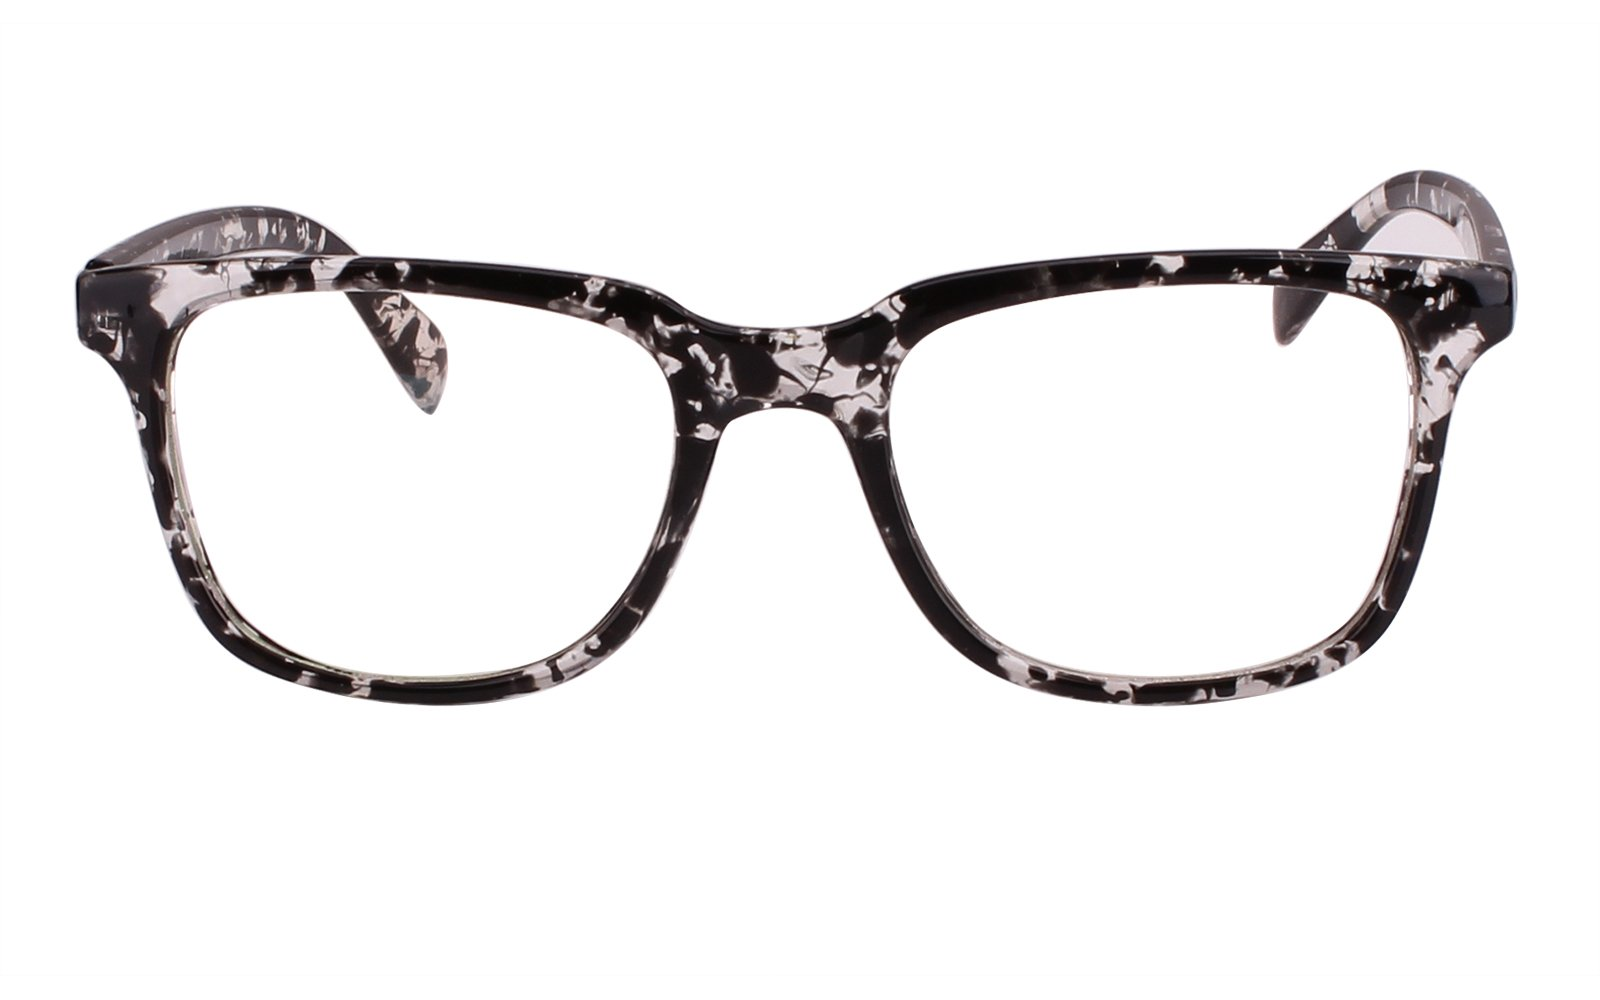 7f5df9ac39e Get Quotations · Agstum Wayfarer Plain Glasses Frame Eyeglasses Clear Lens